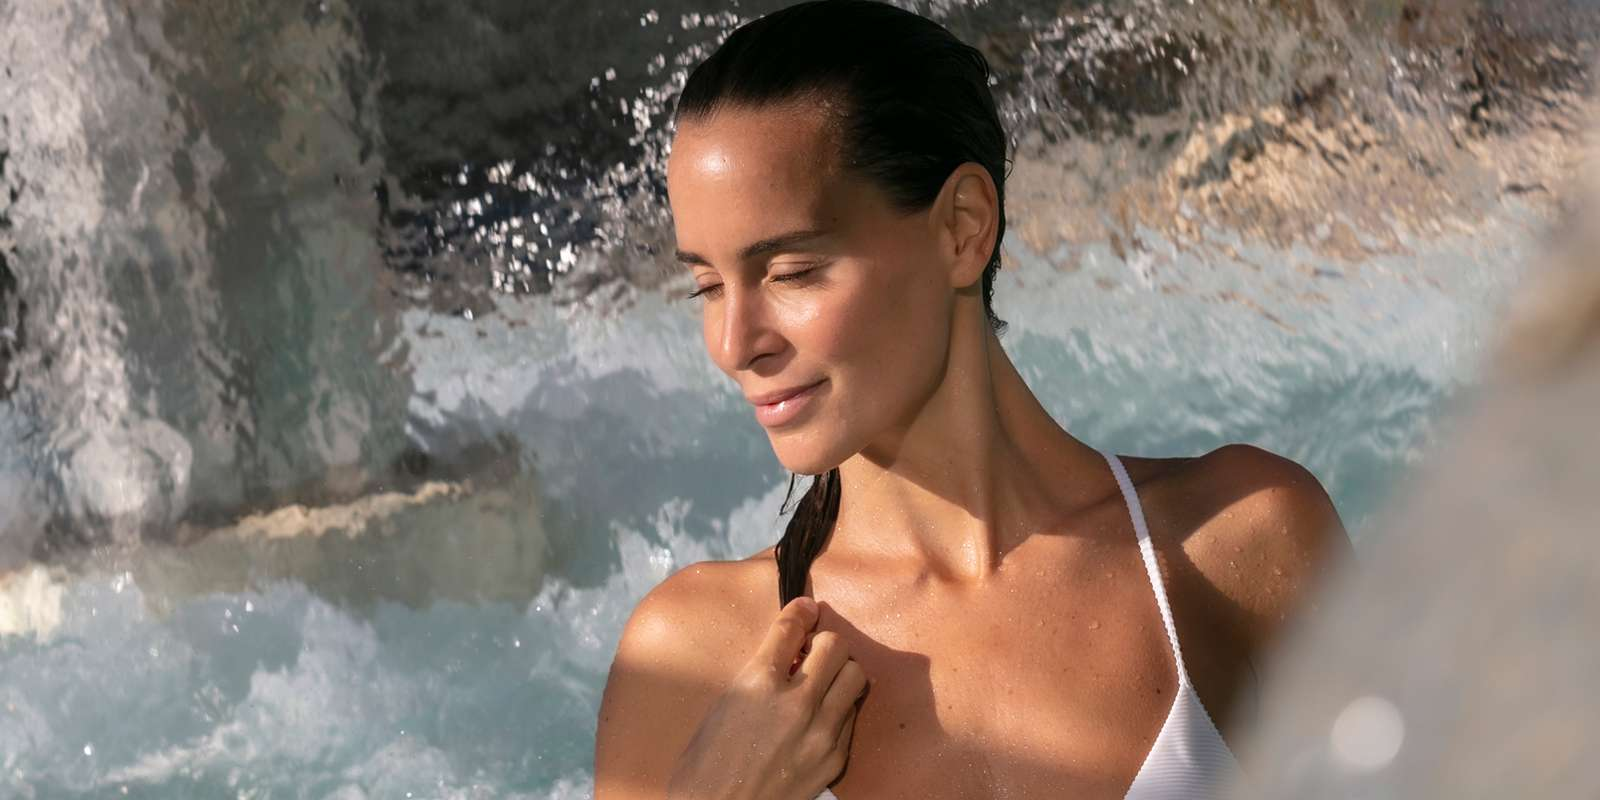 hotel-thalazur-Carnac-parcours-marin-exterieur-femme